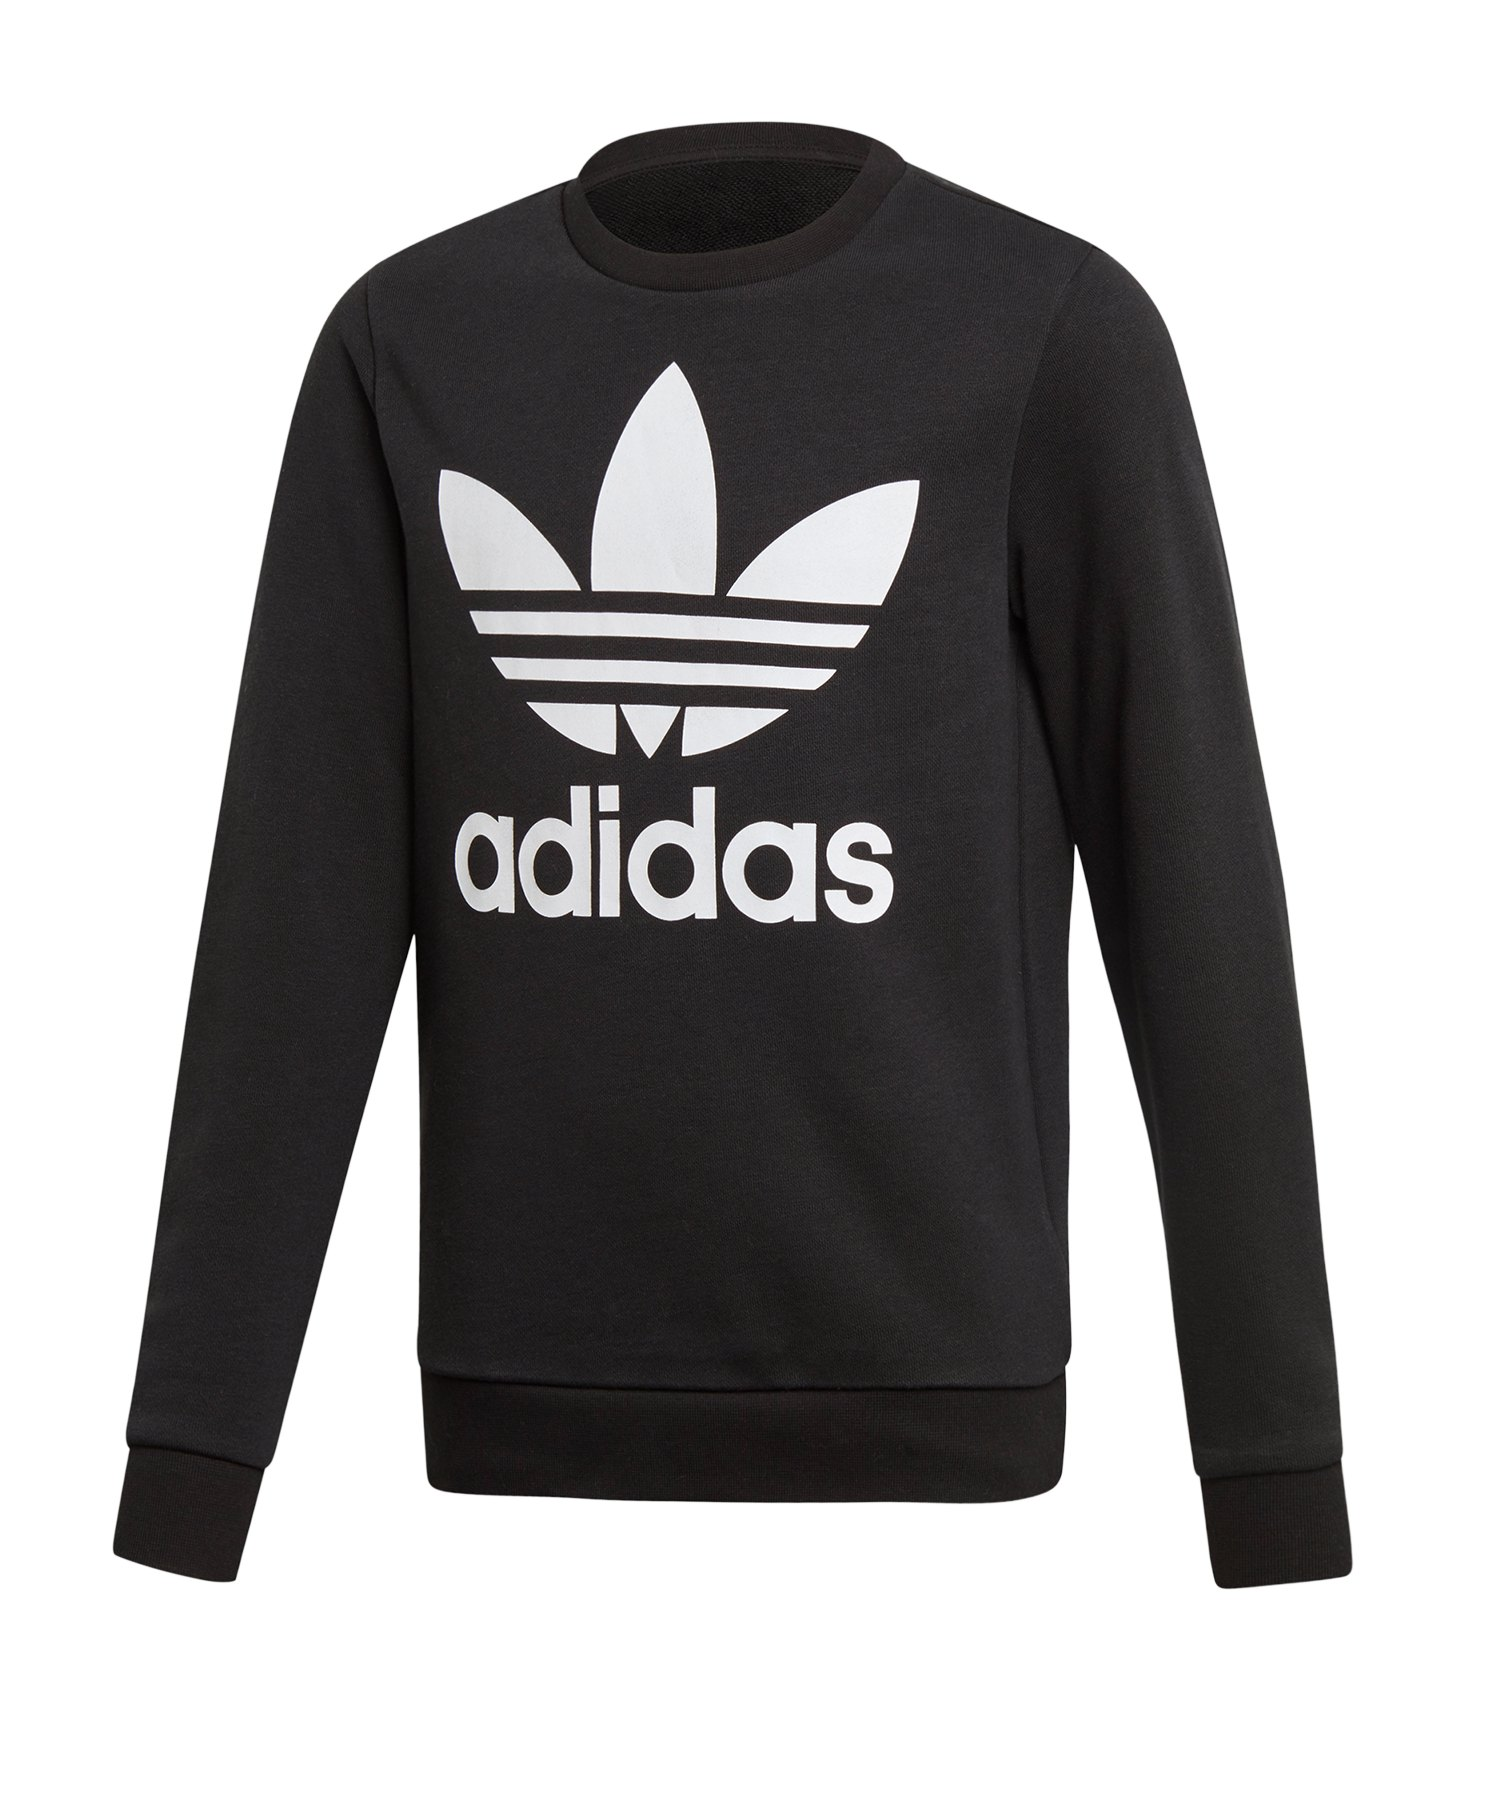 ADIDAS ORIGINALS Sweatshirt TREFOIL CREW SWEAT Hellblau